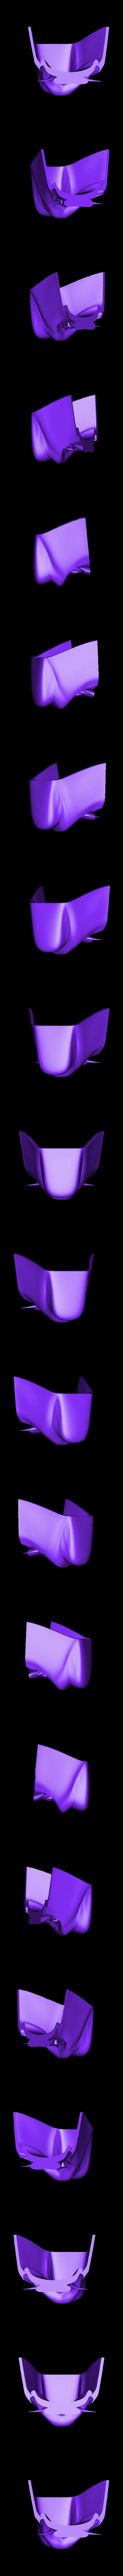 Hannya_Mask_4D.stl Download free STL file Hannya Mask Rurouni Kenshin (Ninja) • Model to 3D print, VillainousPropShop